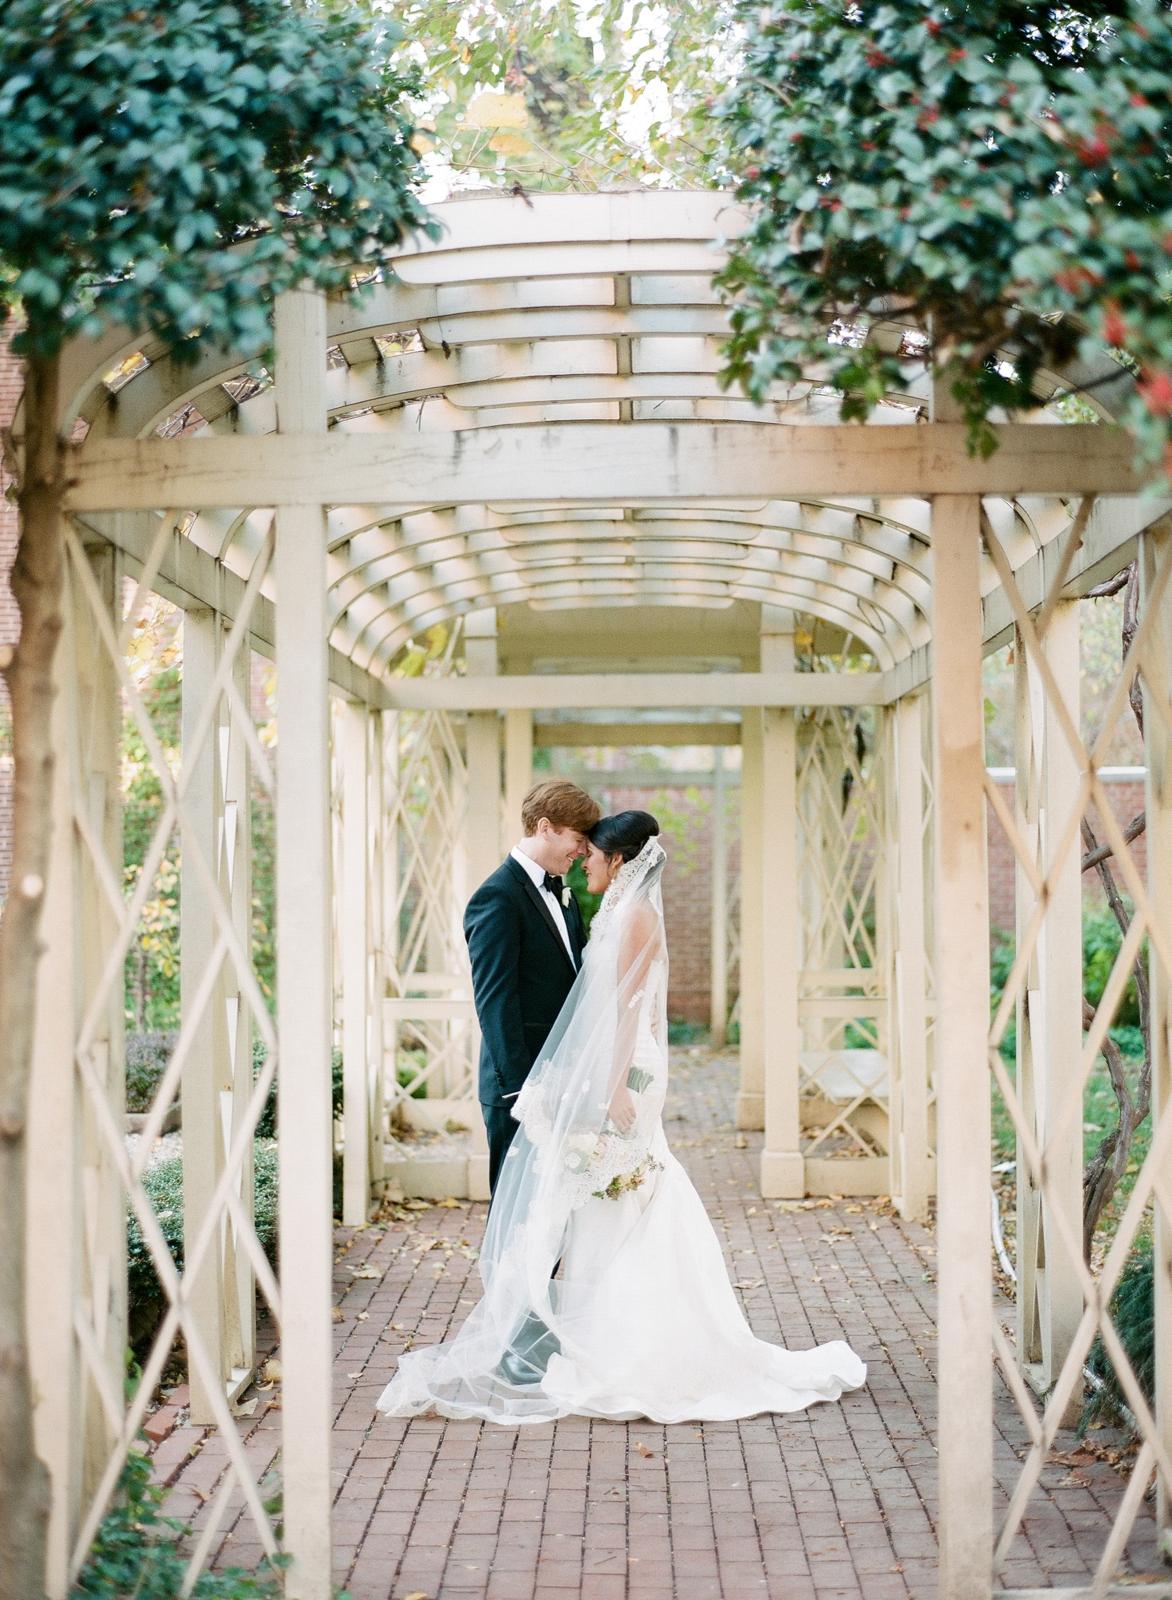 atrium at curtis center wedding photographer philadelphia wedding photographer shannon griffin_0068.jpg